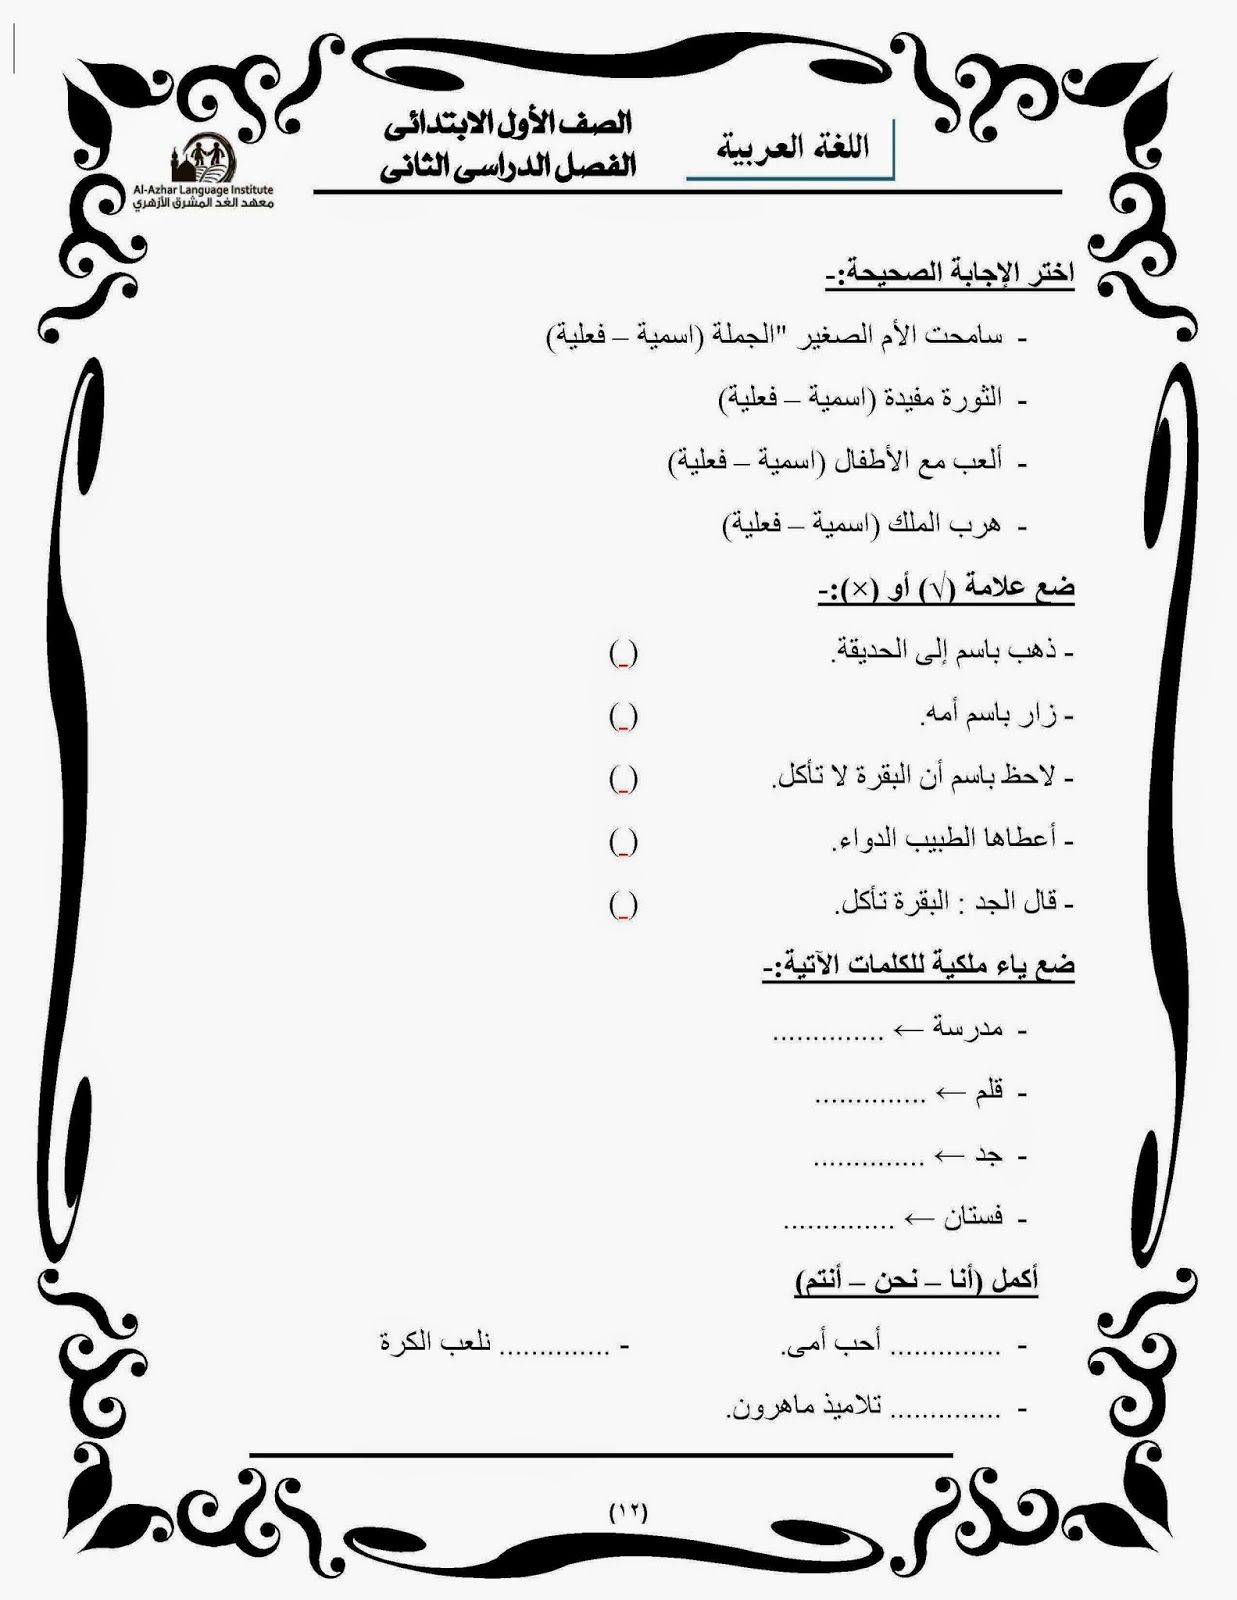 Urdu Grammar Worksheet Grade 1   Printable Worksheets and Activities for  Teachers [ 1600 x 1237 Pixel ]